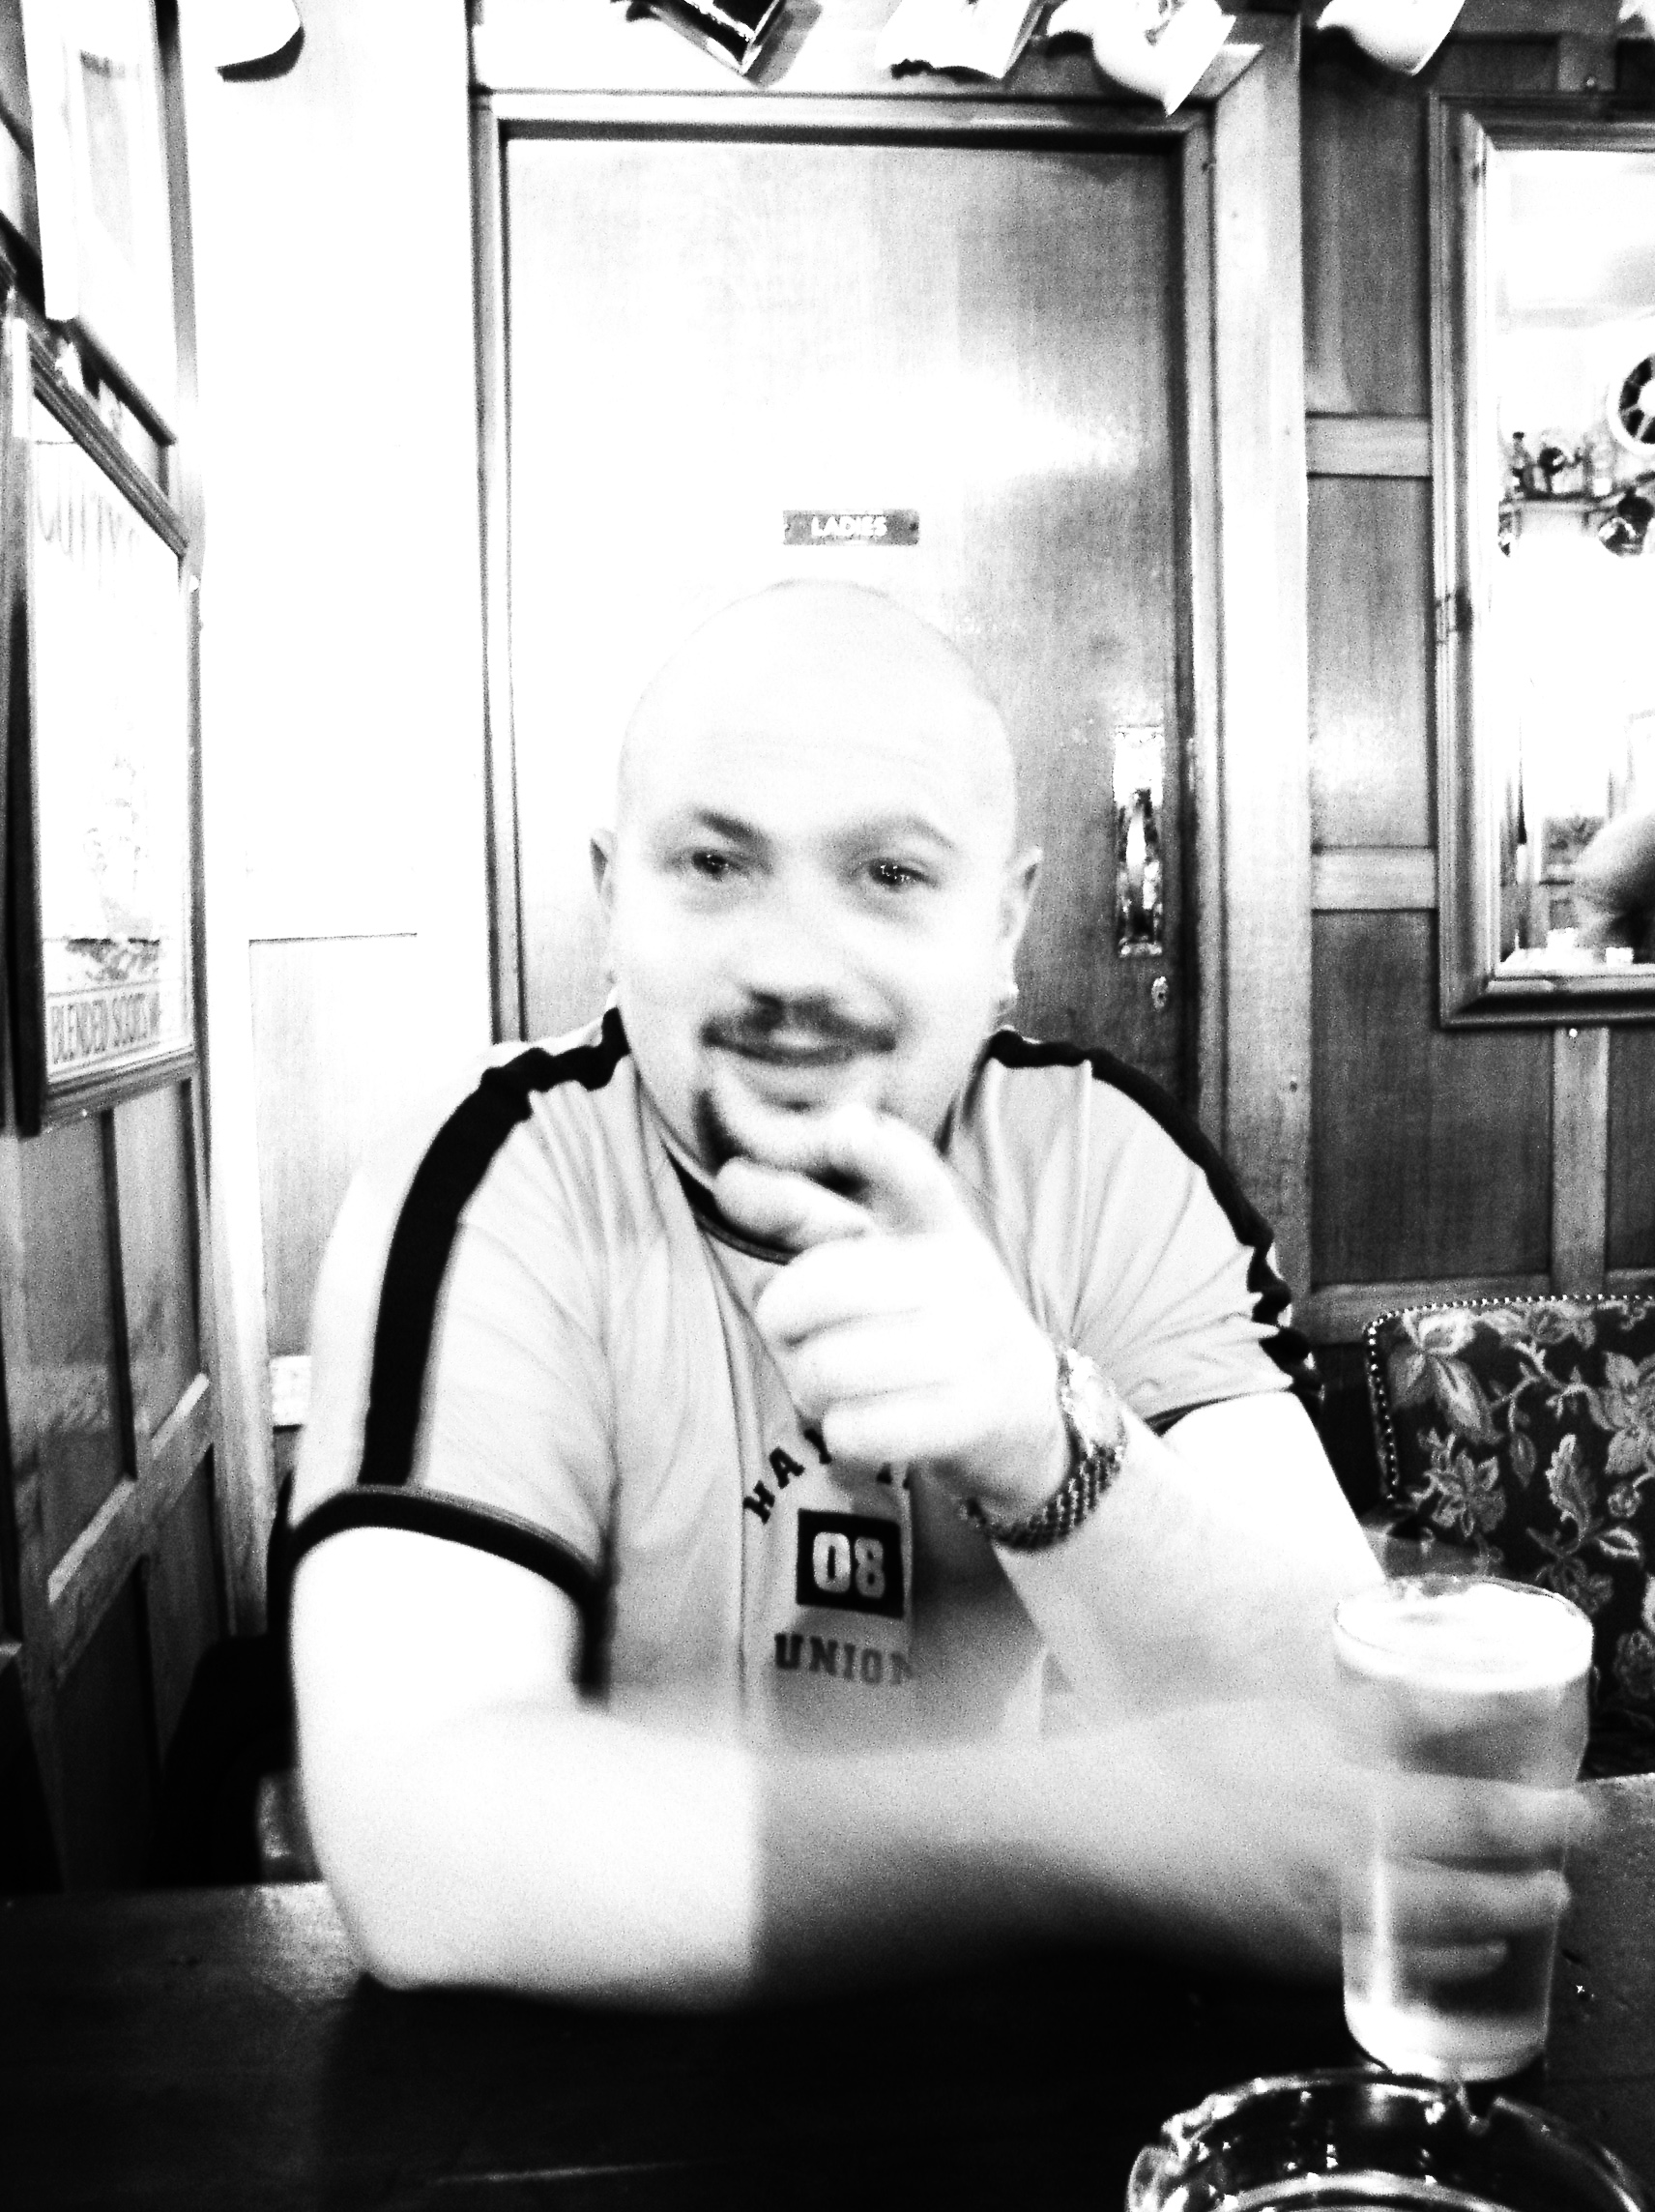 Ian Guest in Travellers Friend - SPIVS - in 2002